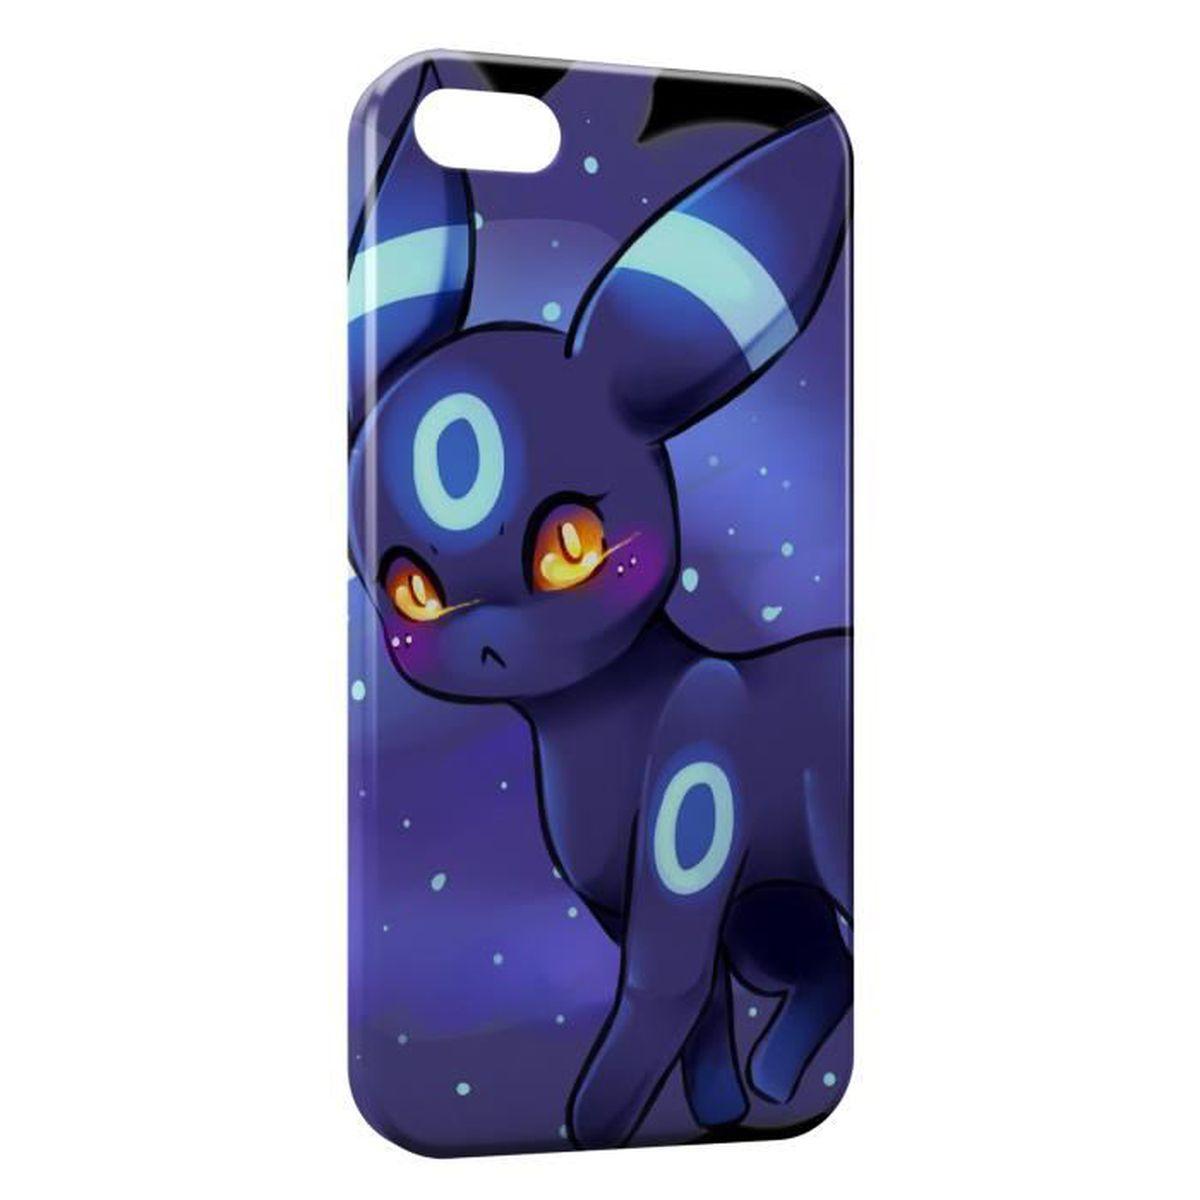 coque iphone 5 5s pokemon violet design